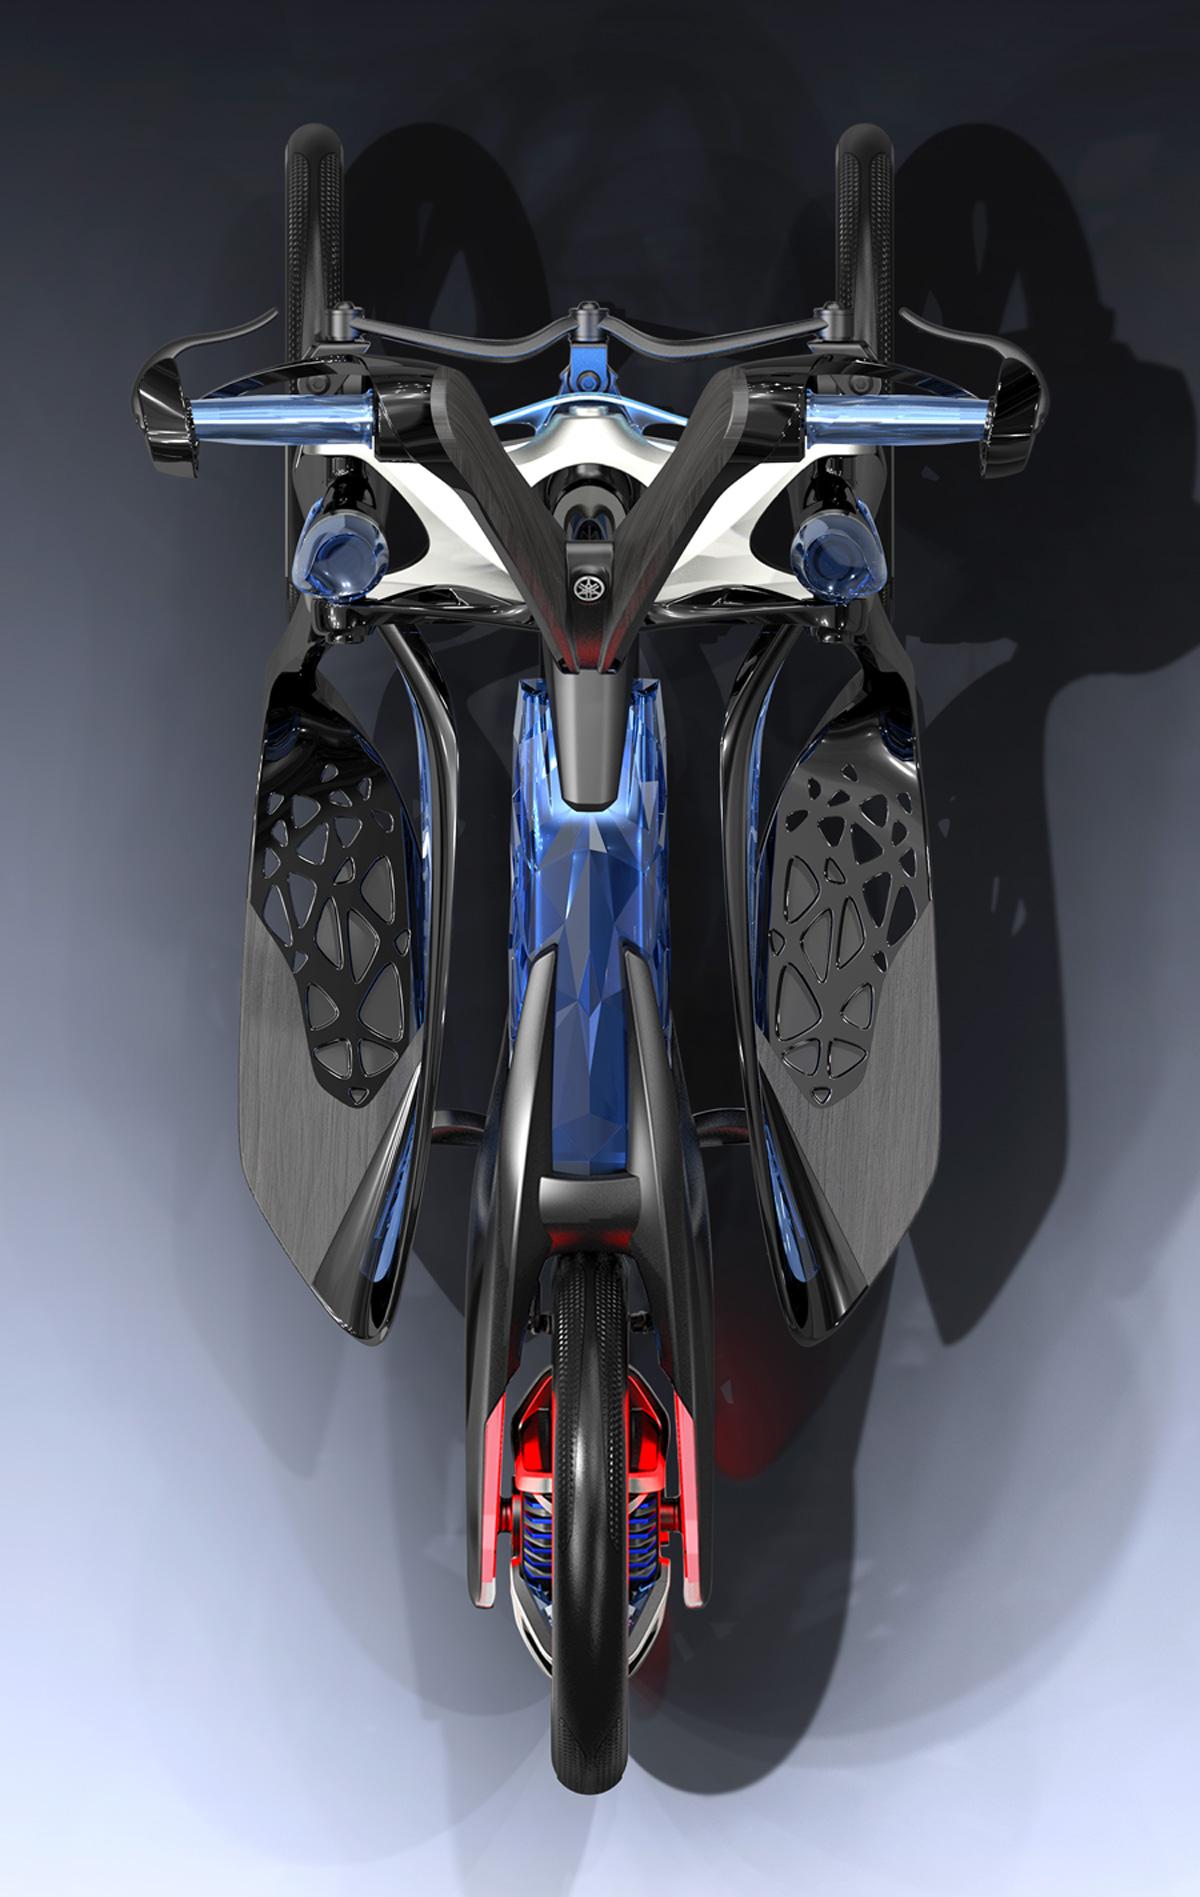 Tritown yamaha motor design for Yamaha motor company profile